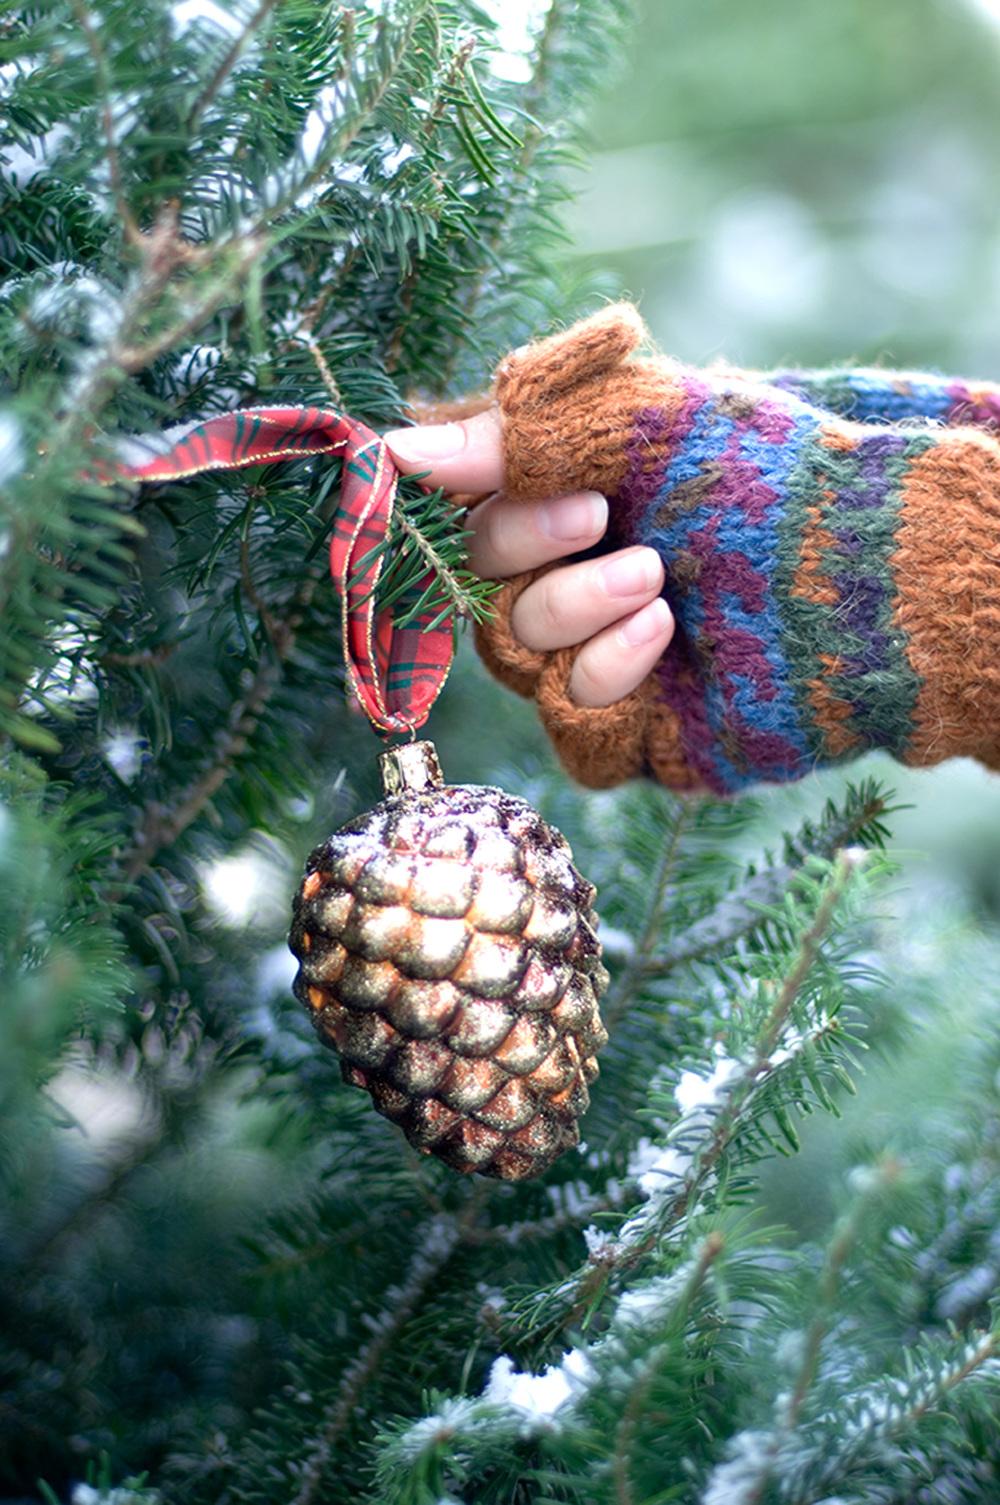 Ornament on Tree 2_2Kpx.jpg